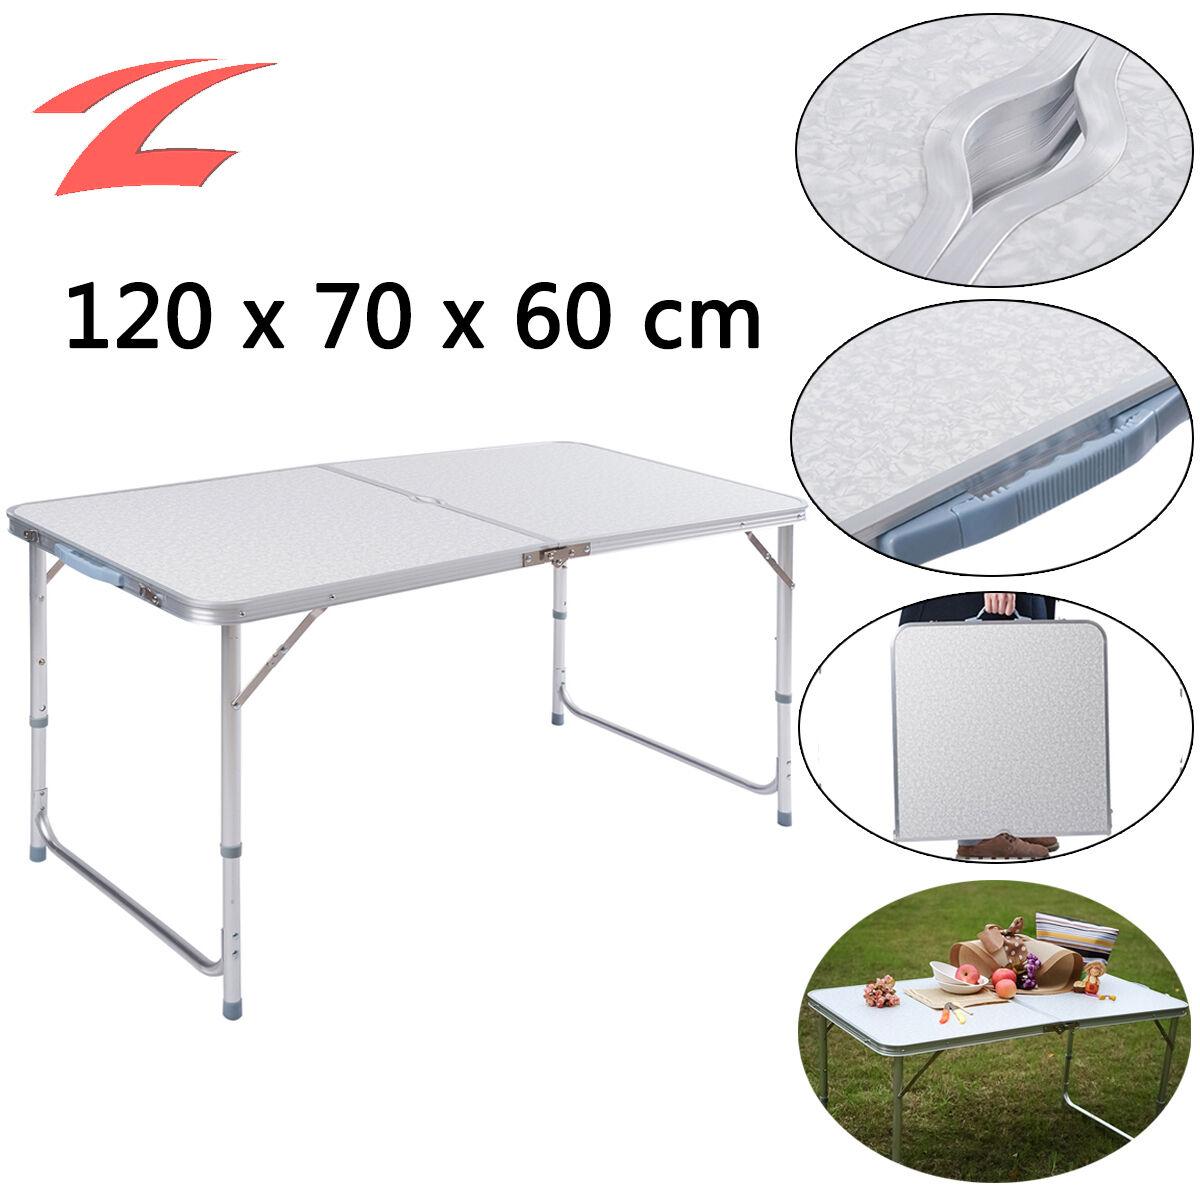 Aluminium Camping Table 120x70x60cm Falttisch Table pliante ...